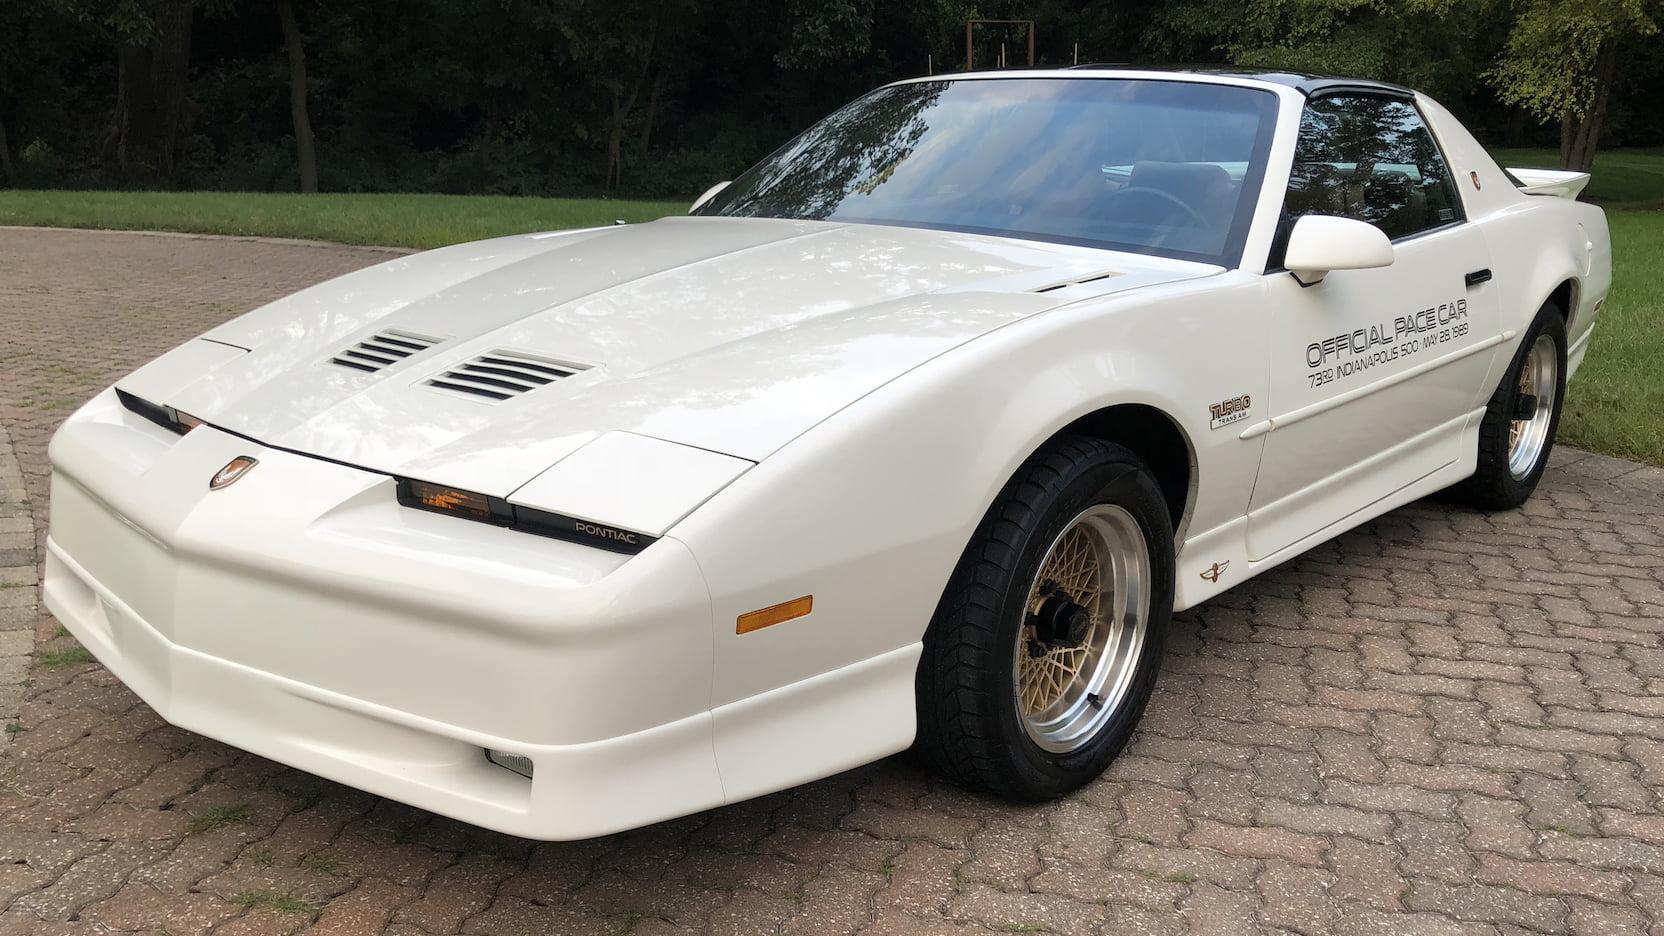 1989 Pontiac Firebird Trans Am 20th Anniversary Edition